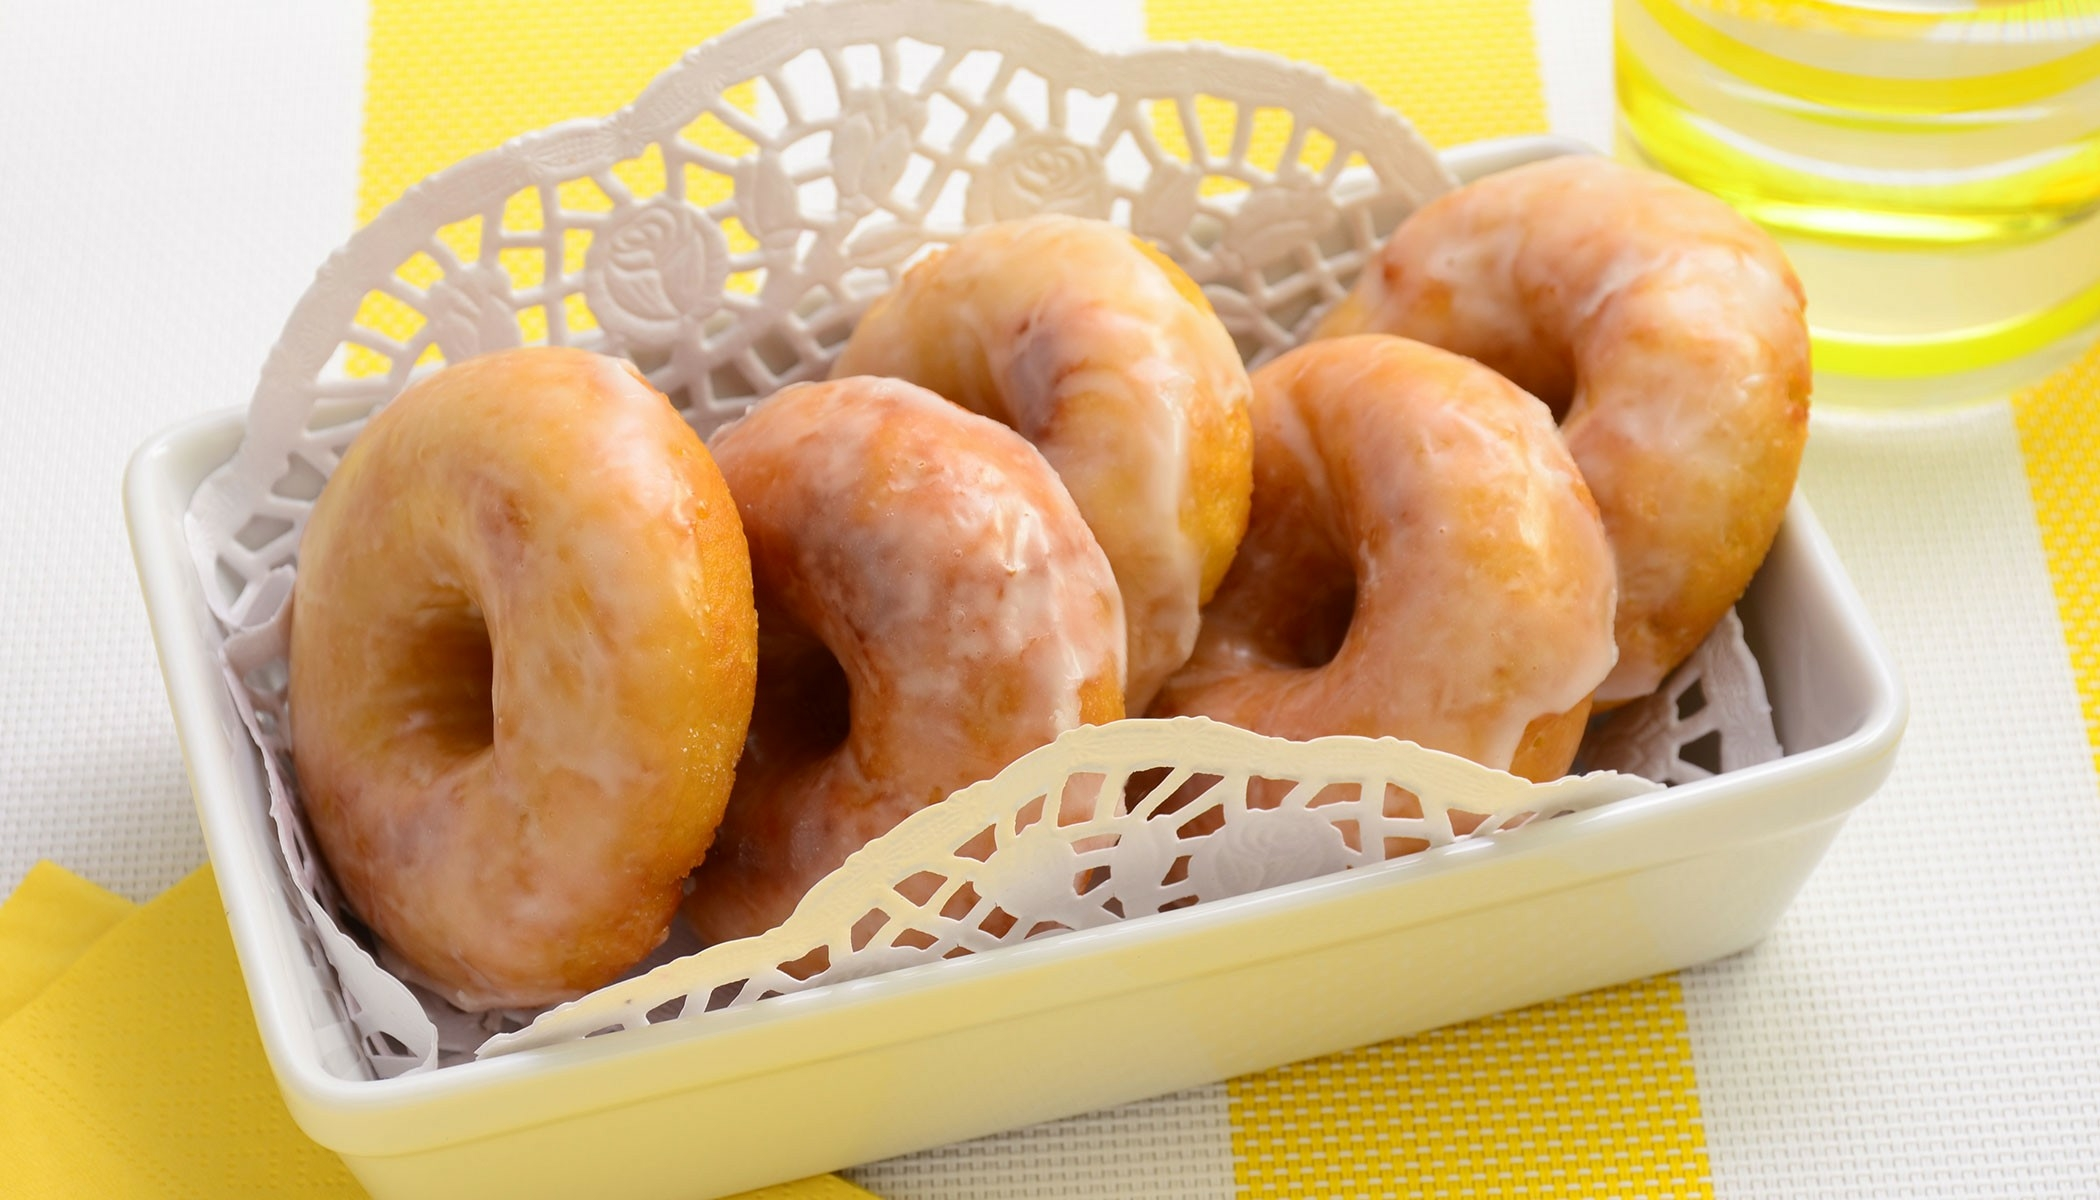 Gluten Free & Guilt Free Donuts